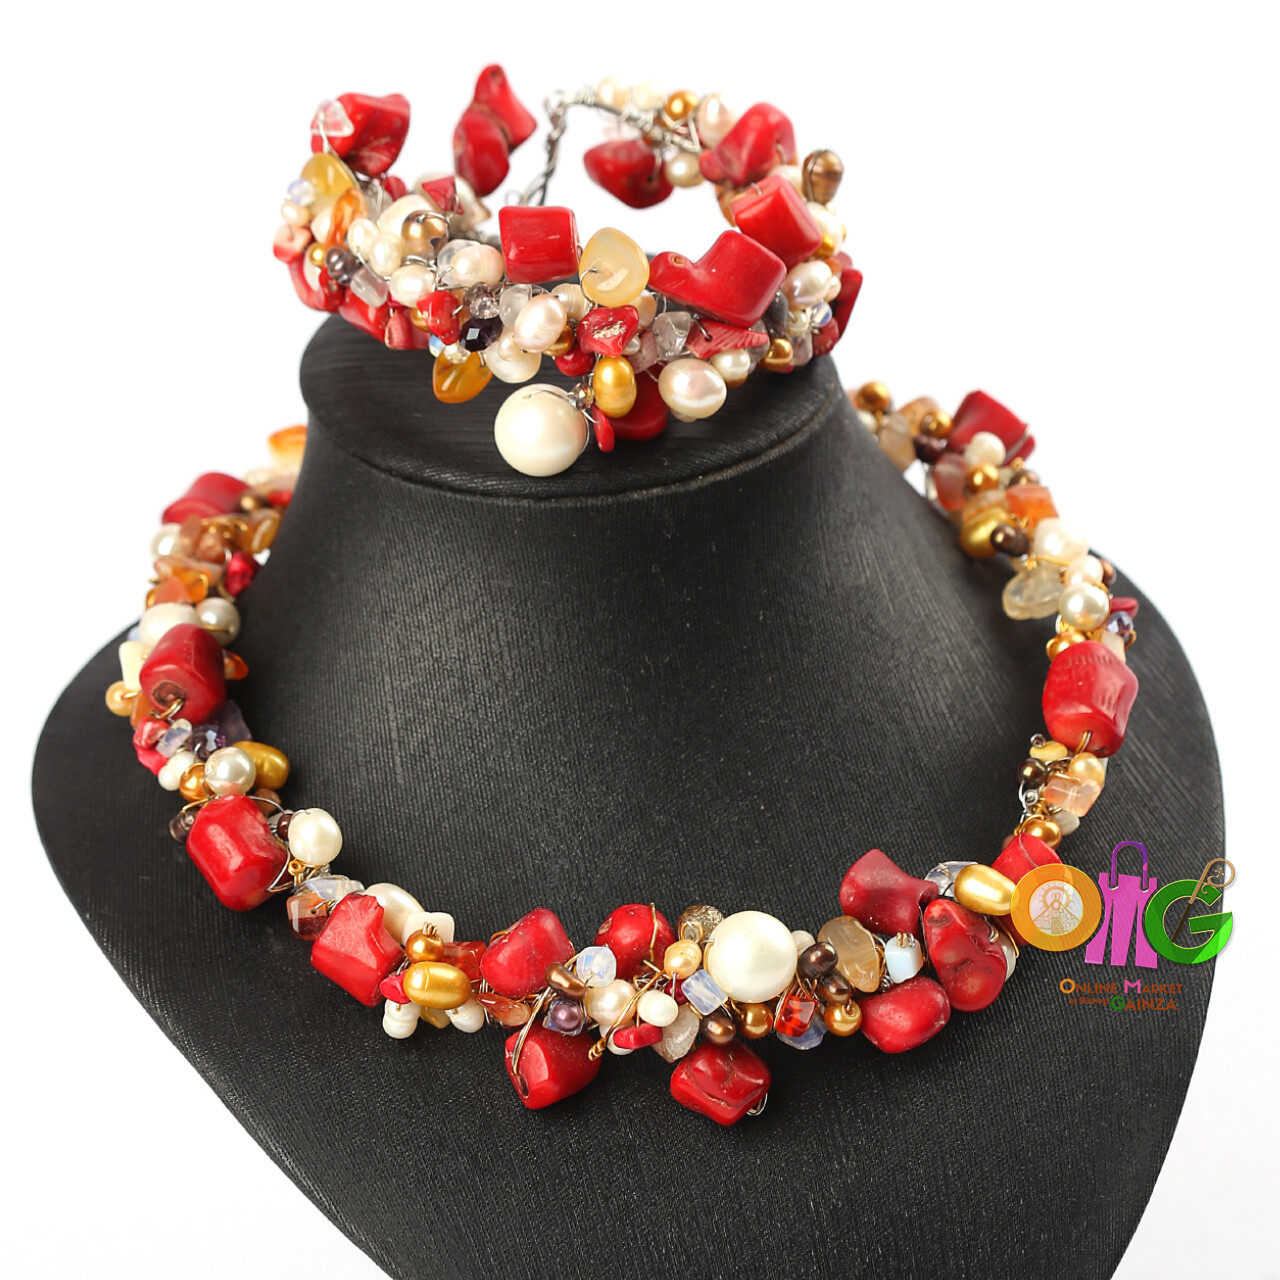 Giwuav Jewelry Creations - Eloise